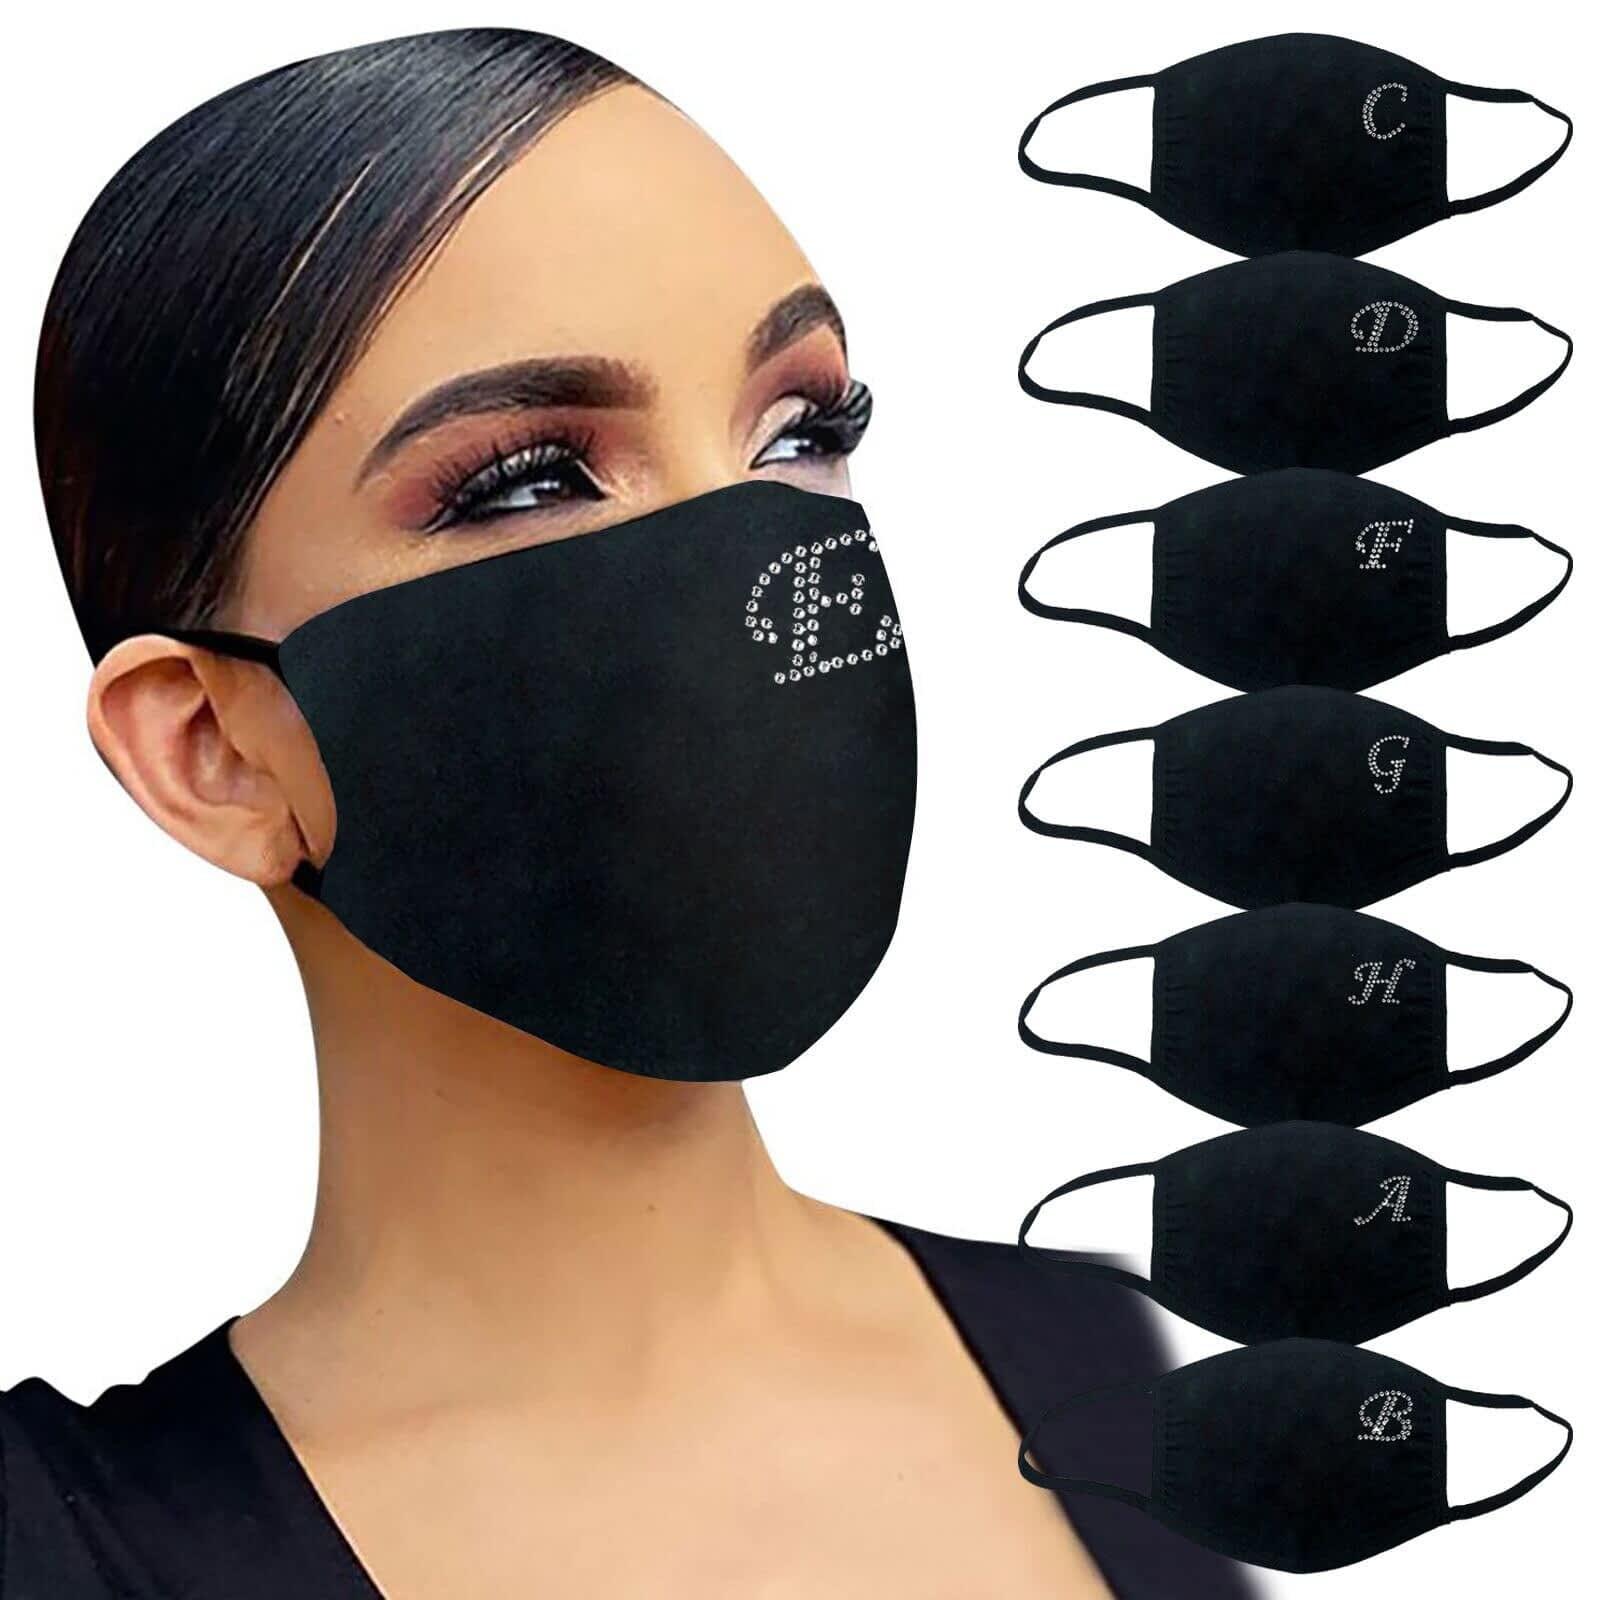 Mascarilla-A-Z-Letter-E-lement-Rhinestone-Pattern-Face-Mask-Fashion-Women-Mouth-Mask-Cotton-Black.jpg